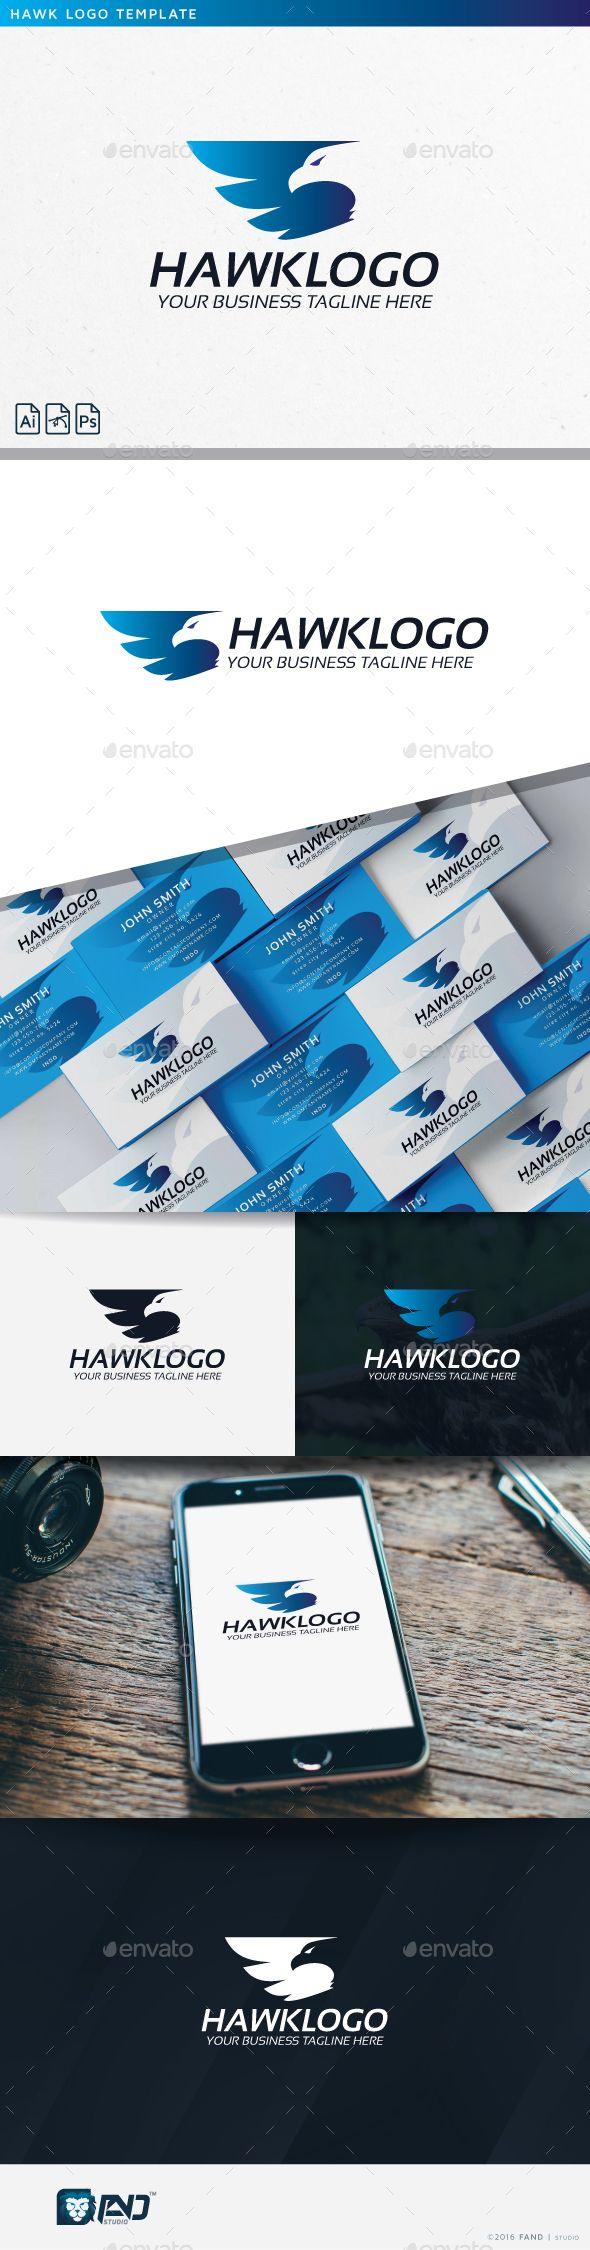 Hawk Logo — Photoshop PSD #media #bird • Available here → https://graphicriver.net/item/hawk-logo/14688808?ref=pxcr